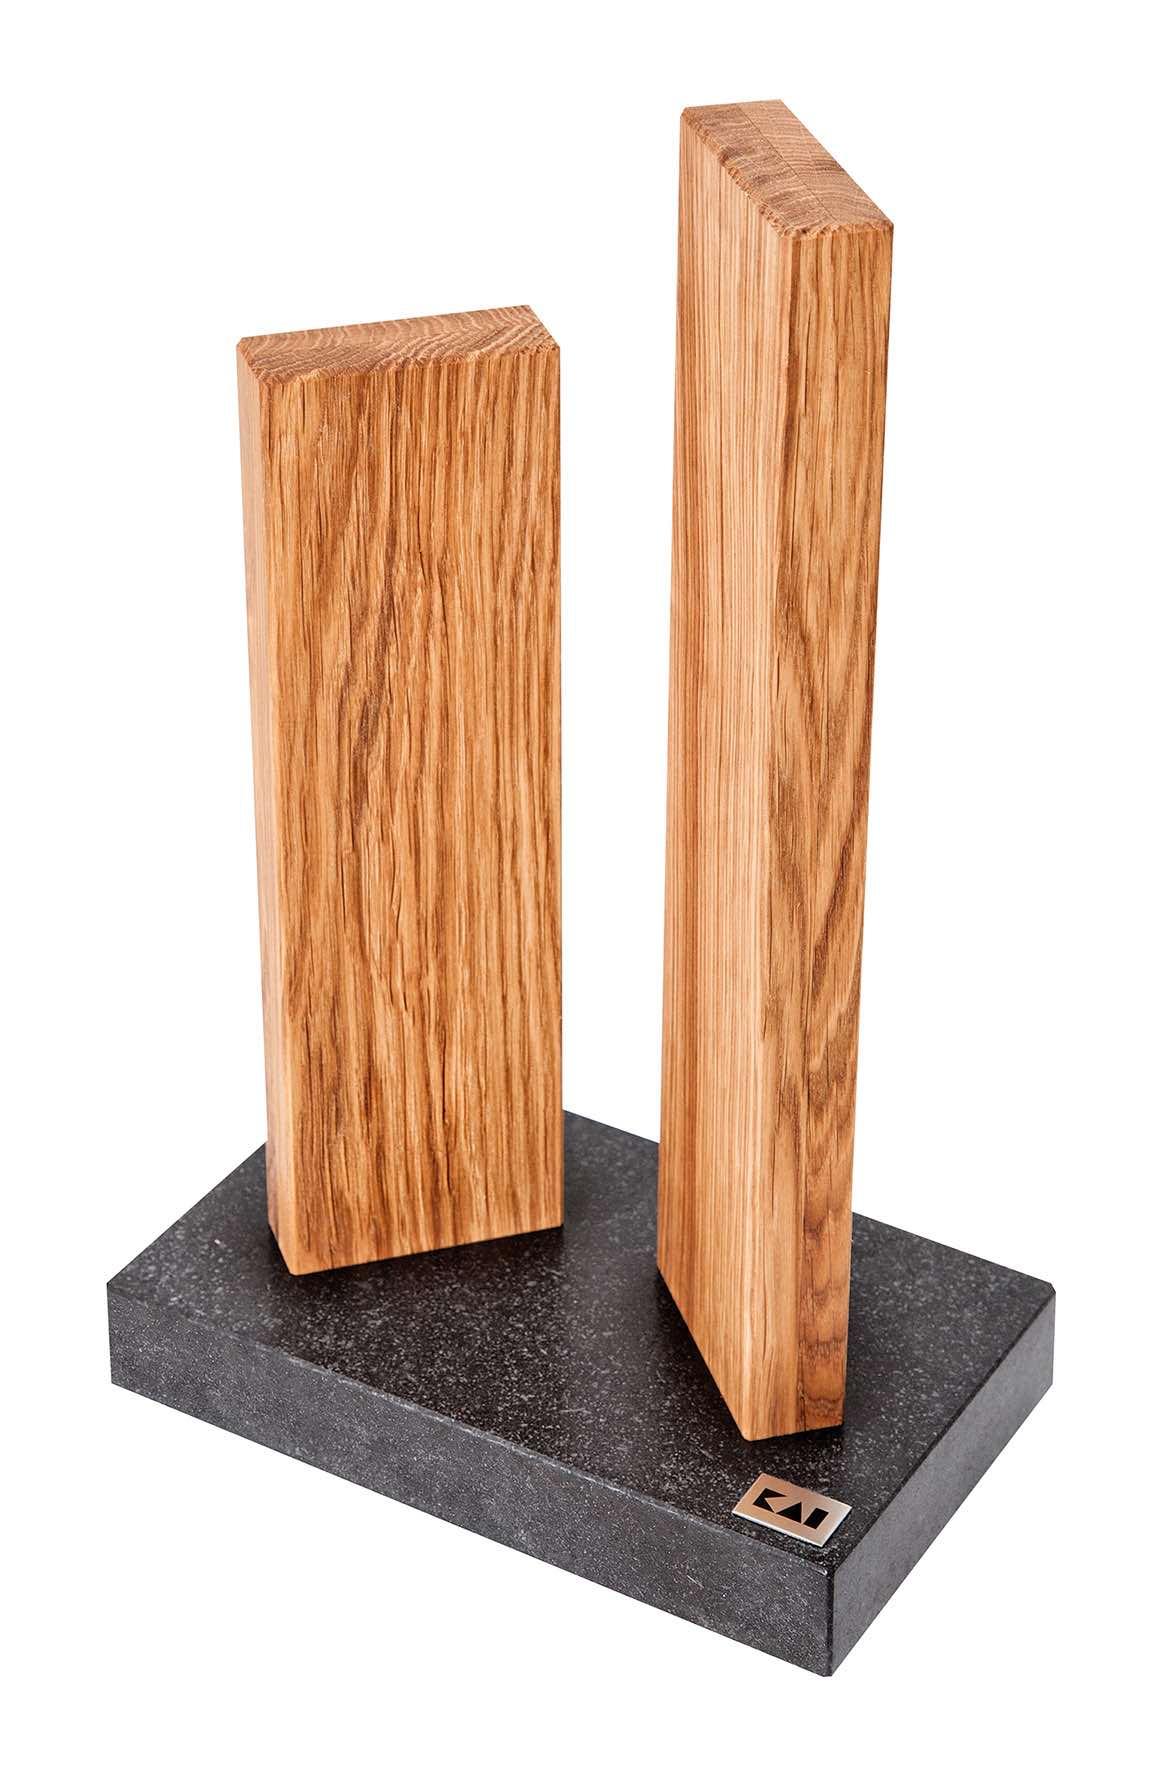 kai magnet messerblock stonehenge granit eiche sth 3 3 ebay. Black Bedroom Furniture Sets. Home Design Ideas